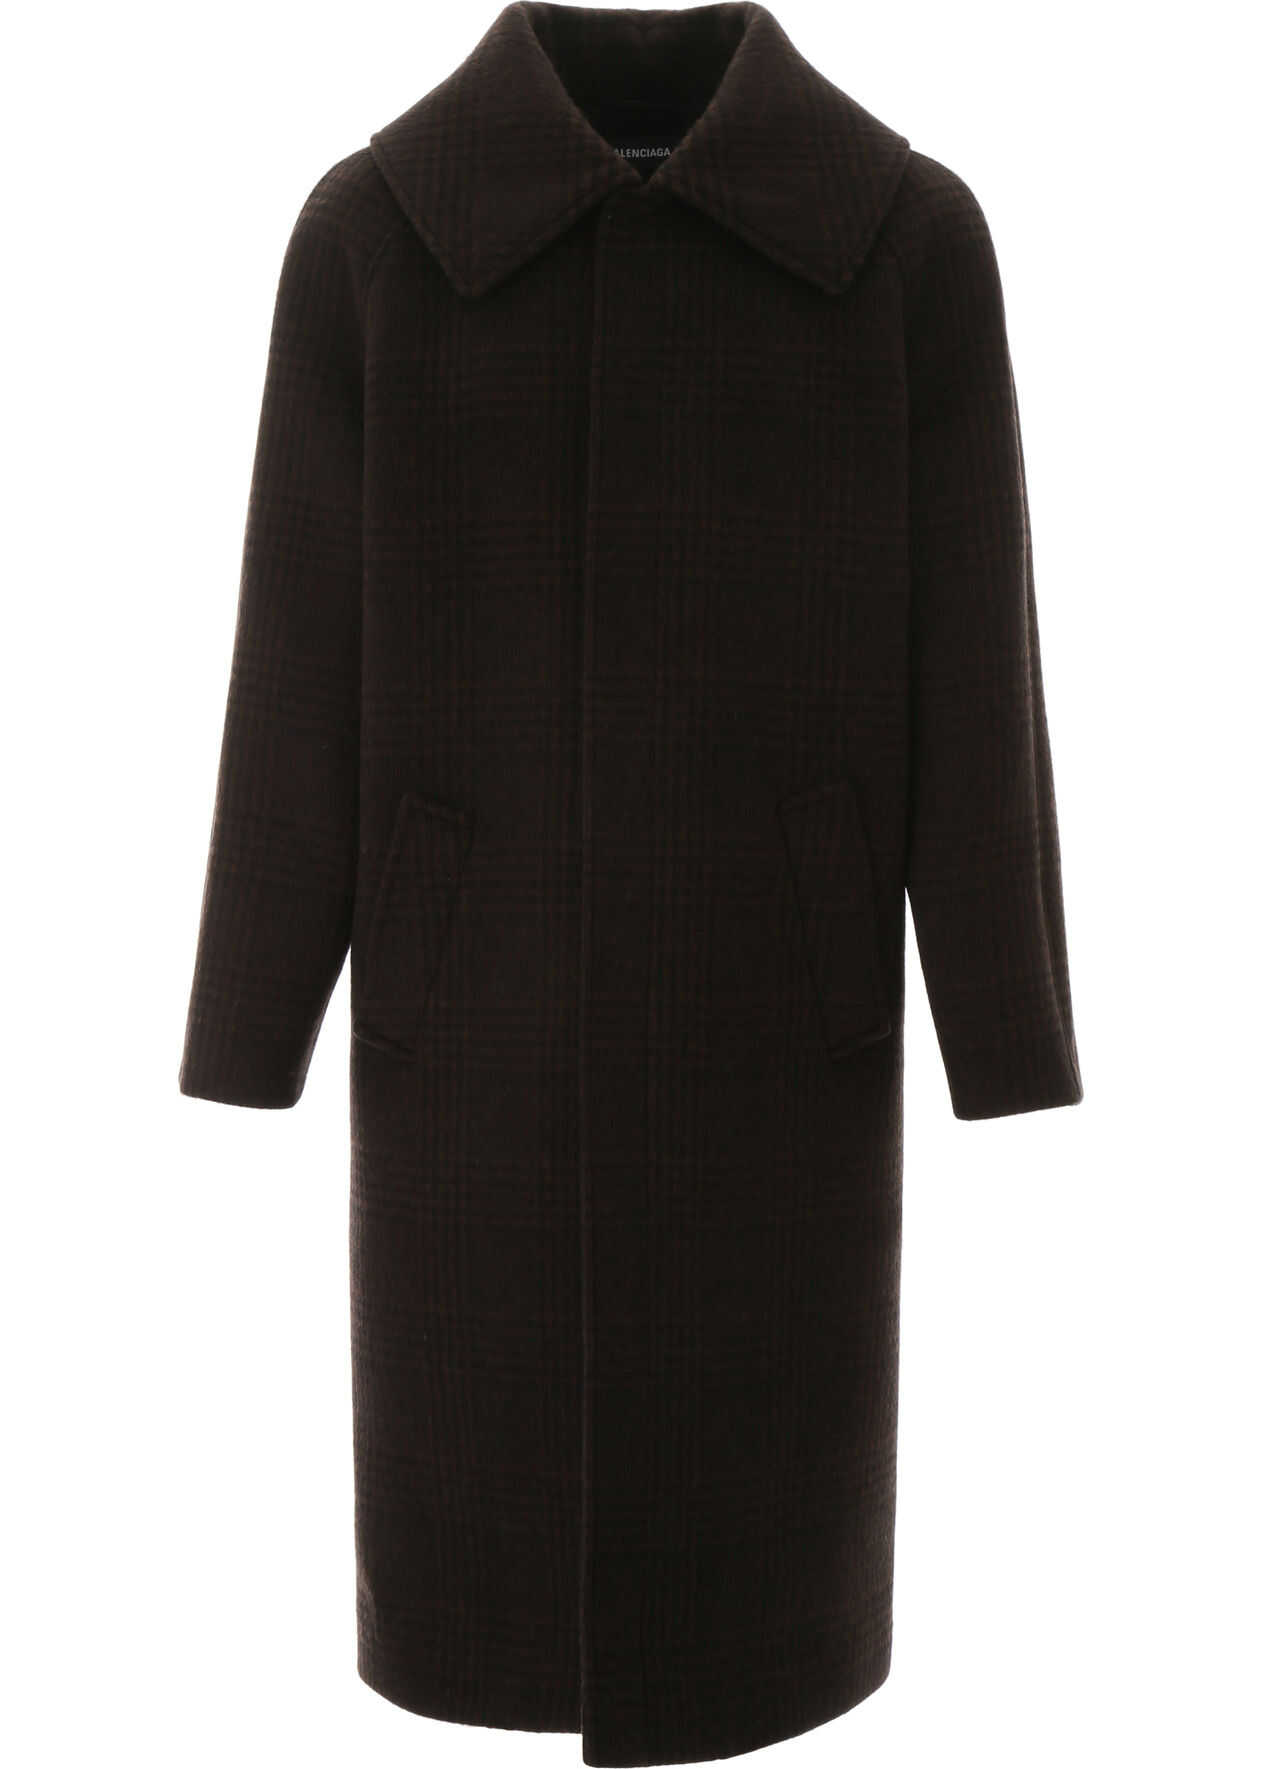 Balenciaga Incognito Coat BROWN